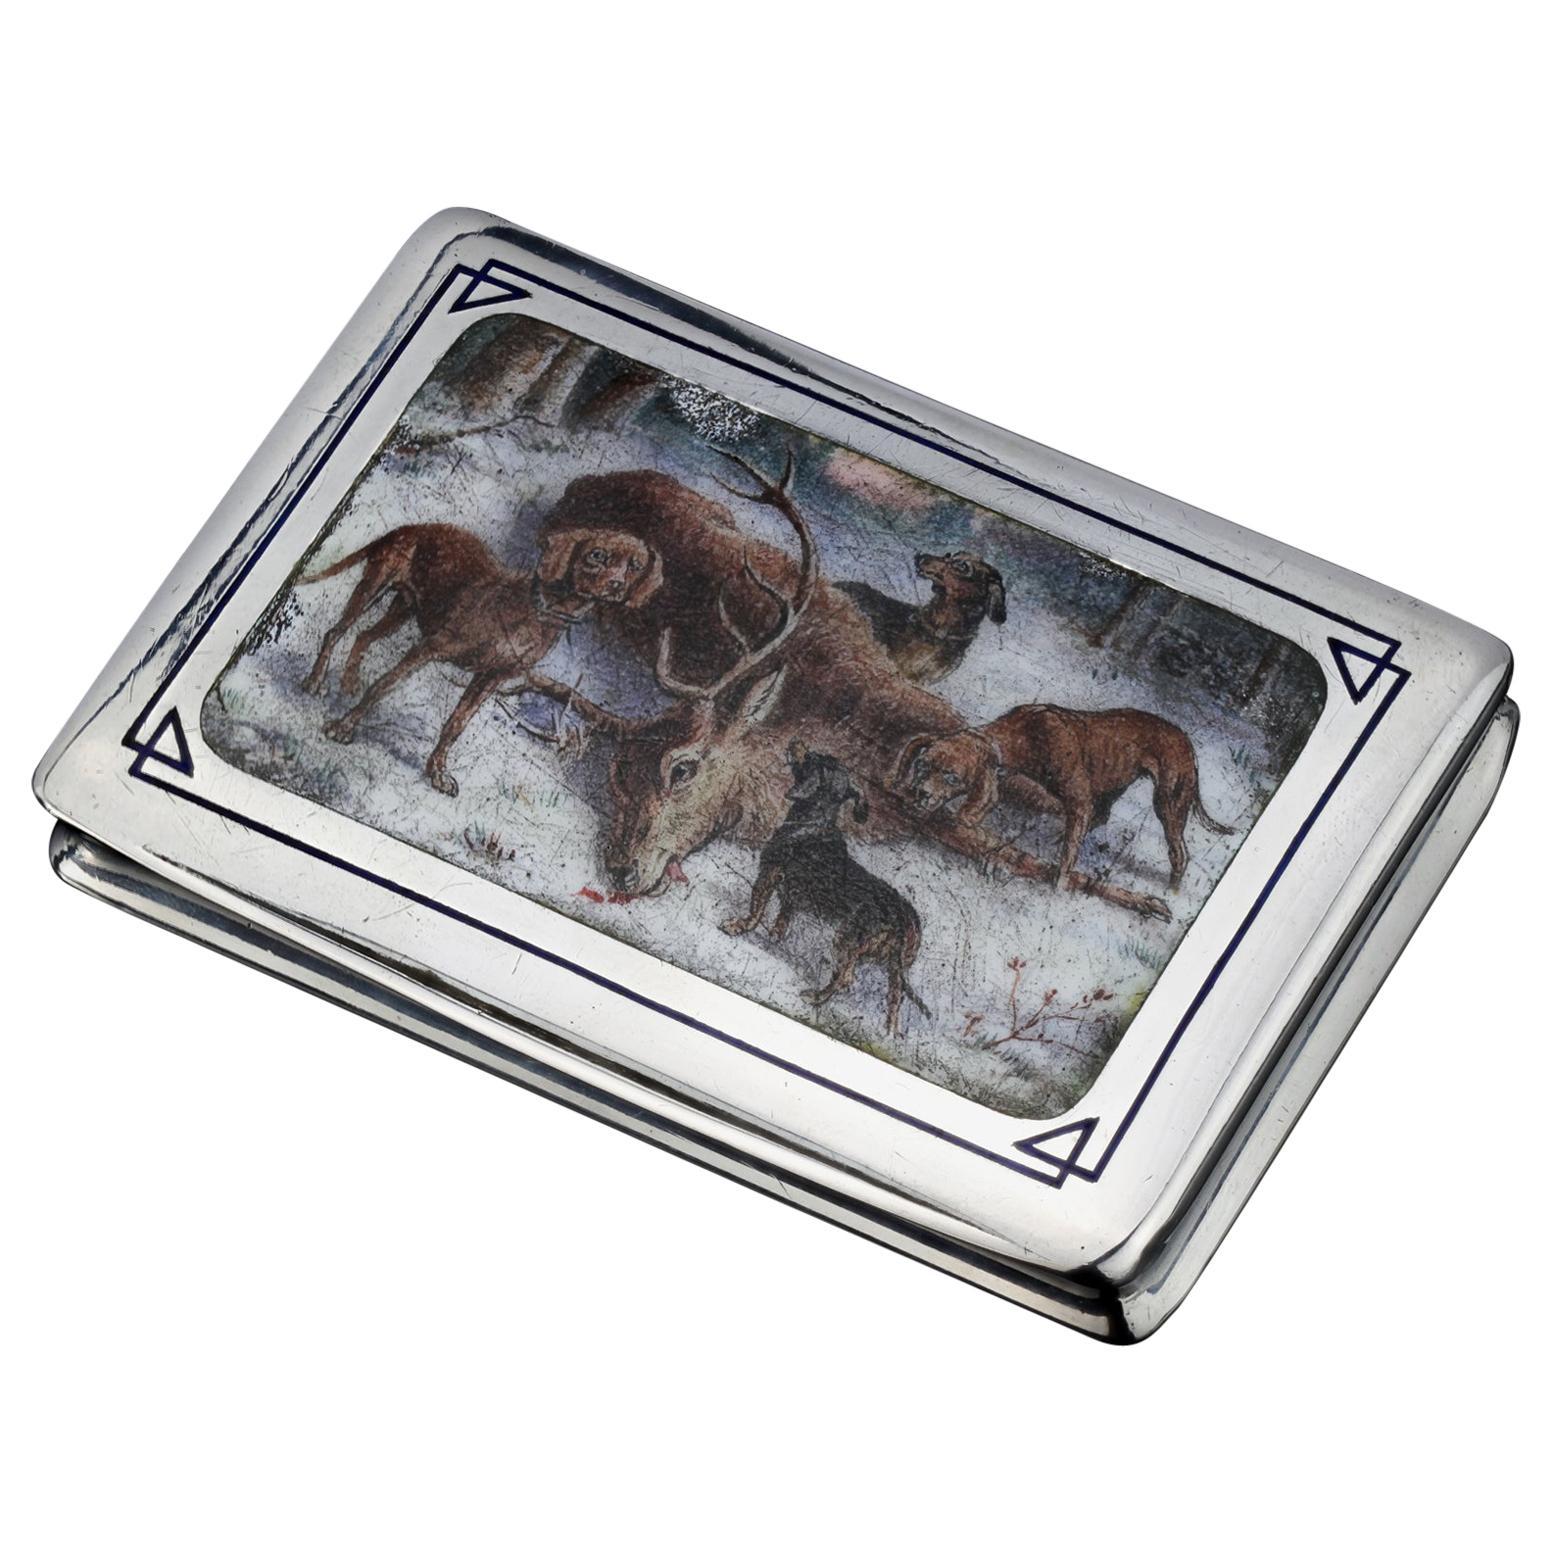 Antique Silver Enamel Painting Hunting Scene Box, Europe